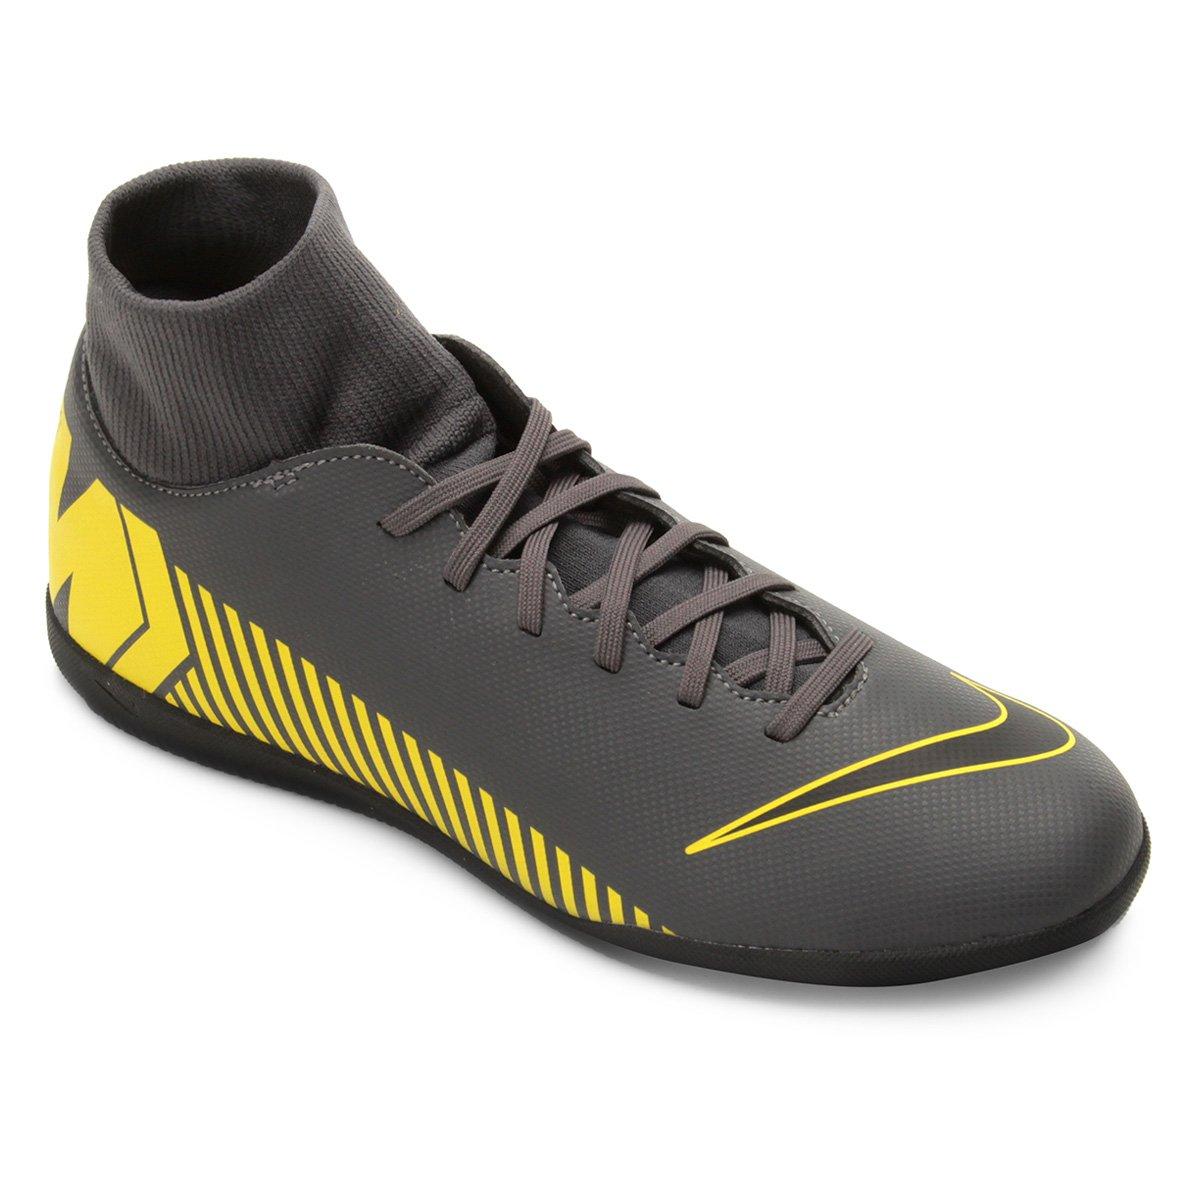 b38d998e9 FornecedorNetshoes. Chuteira Futsal Nike Mercurial Superfly 6 Club IC